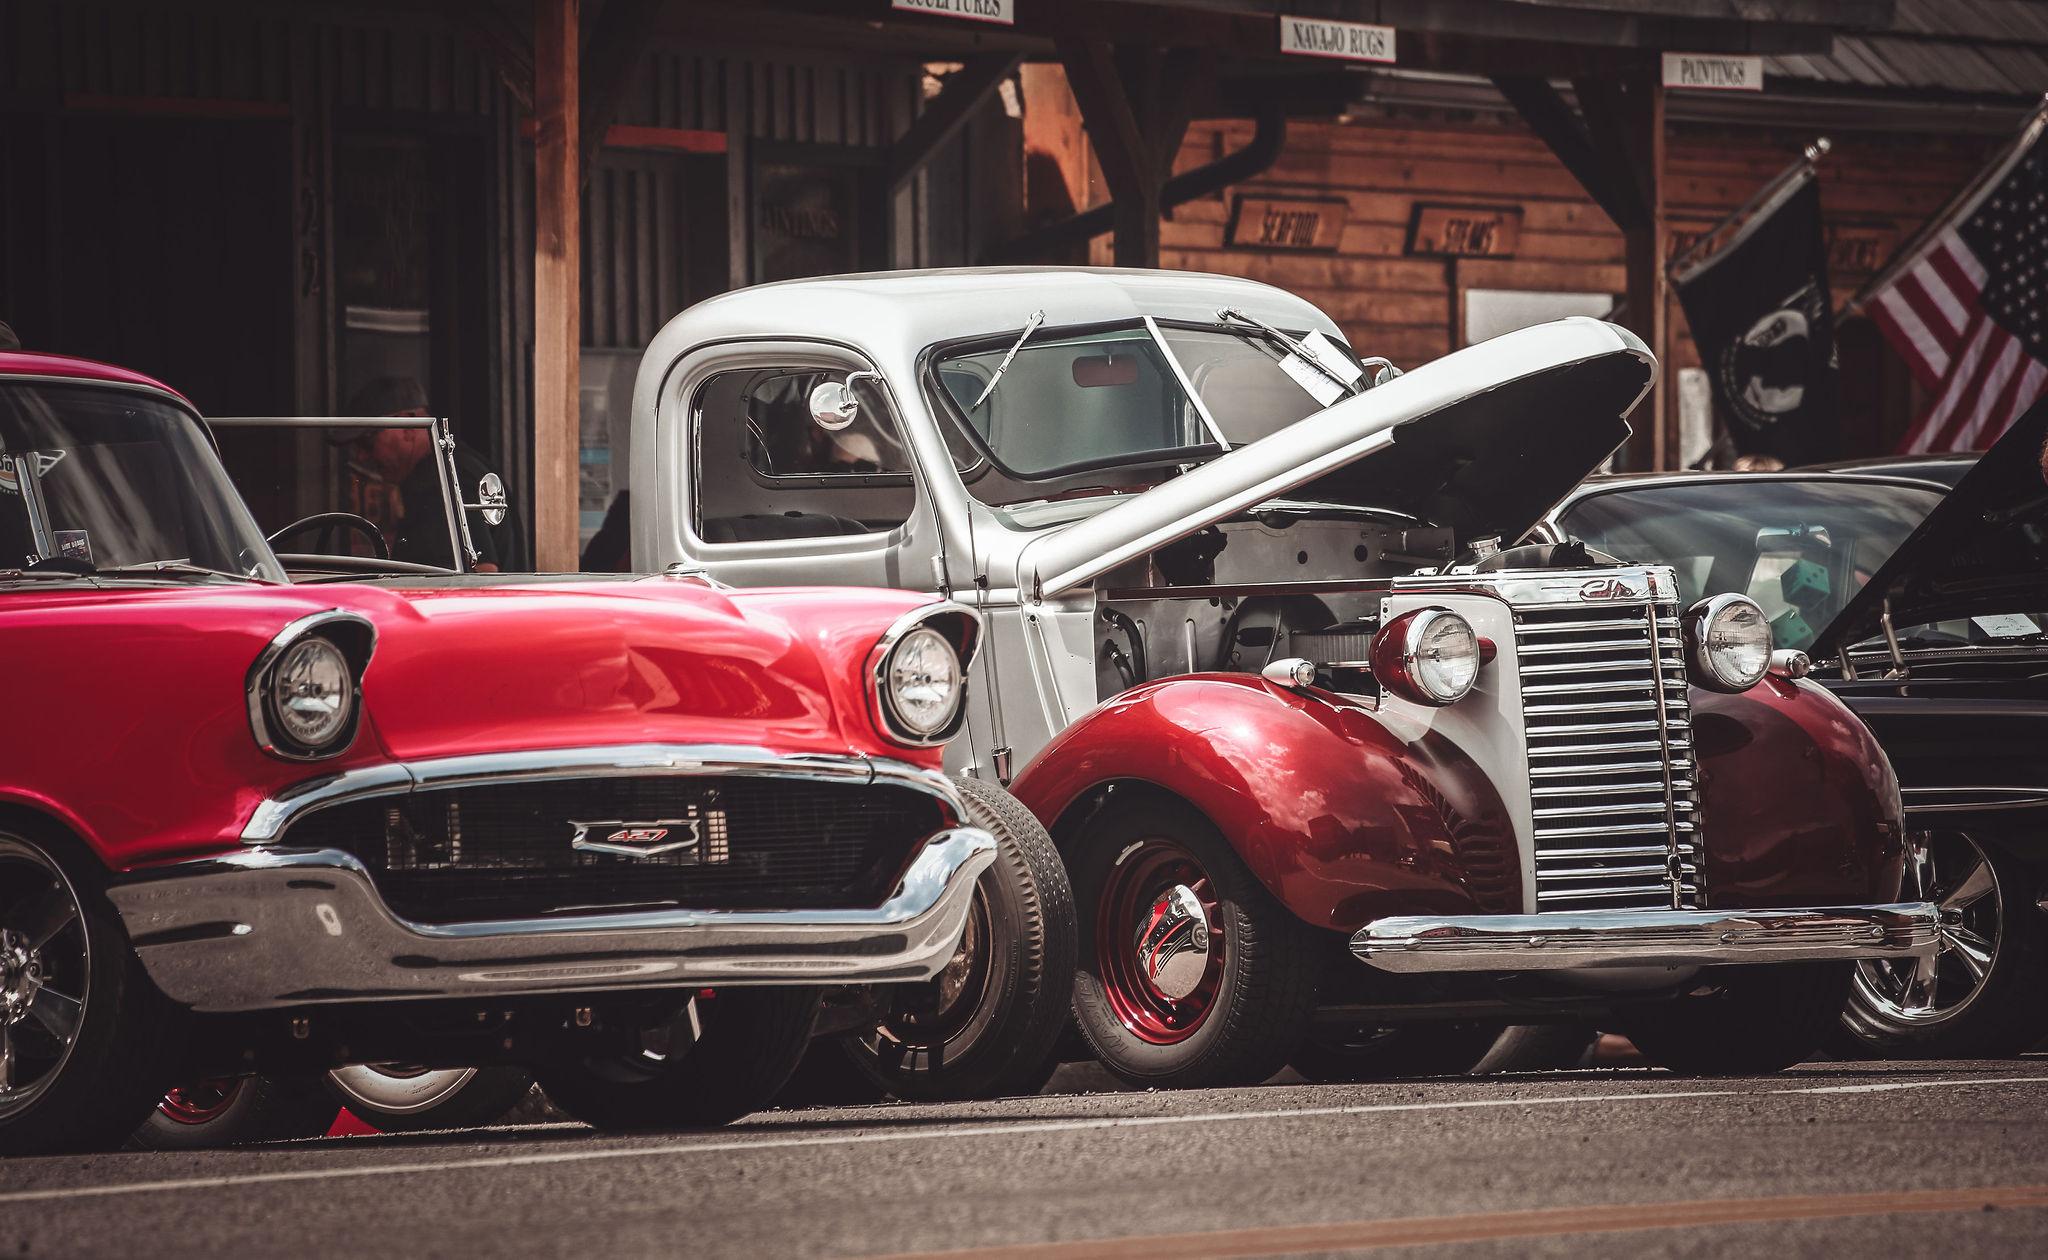 big-timber montana sweet-grass-fest car-show classic-cars